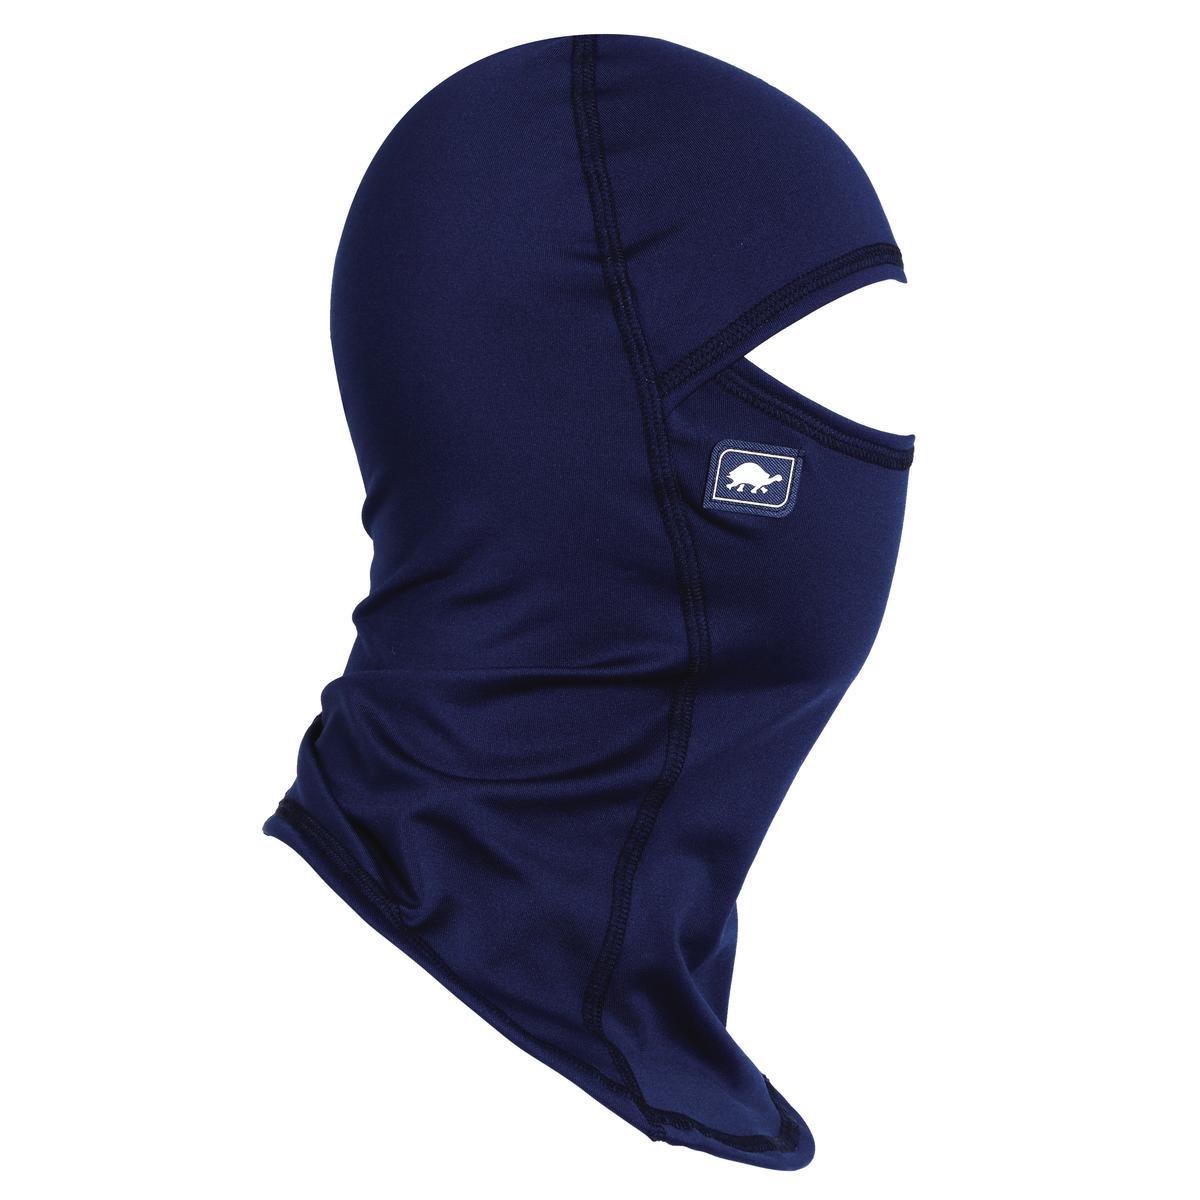 Turtle Fur Comfort Shell Ninja Balaclava Navy - One Size